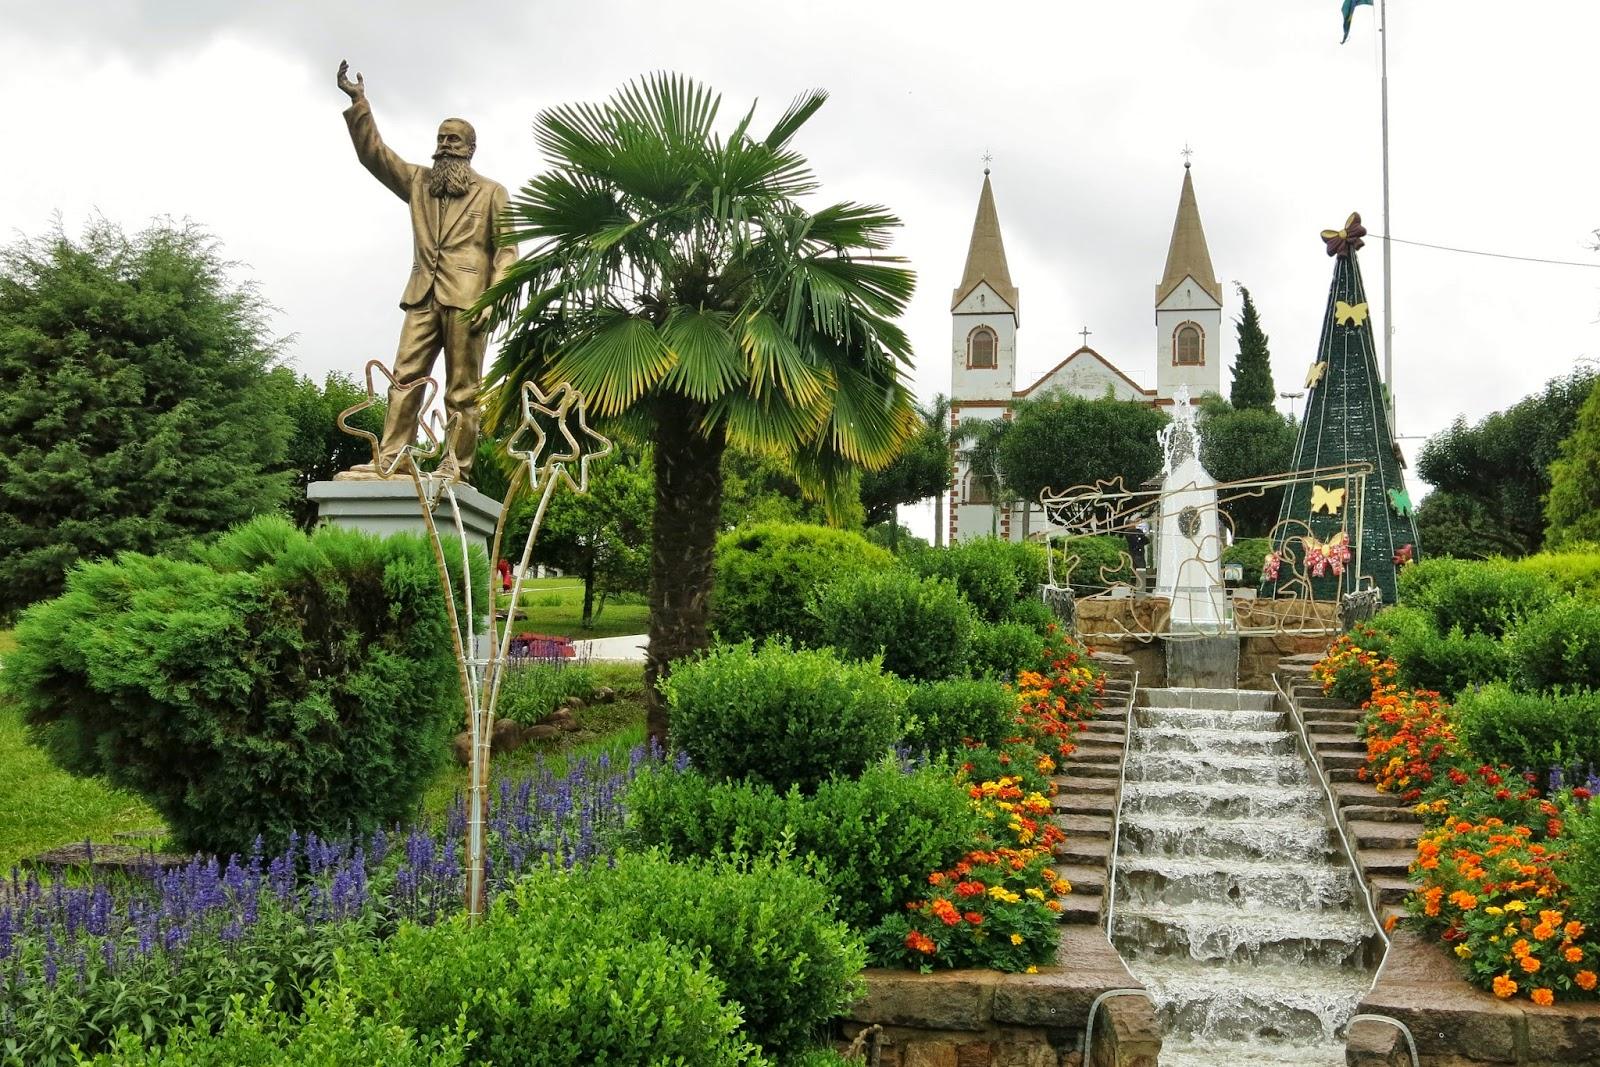 Igreja da Matriz e o busto de Andreas Thaler, fundador de Treze Tílias.